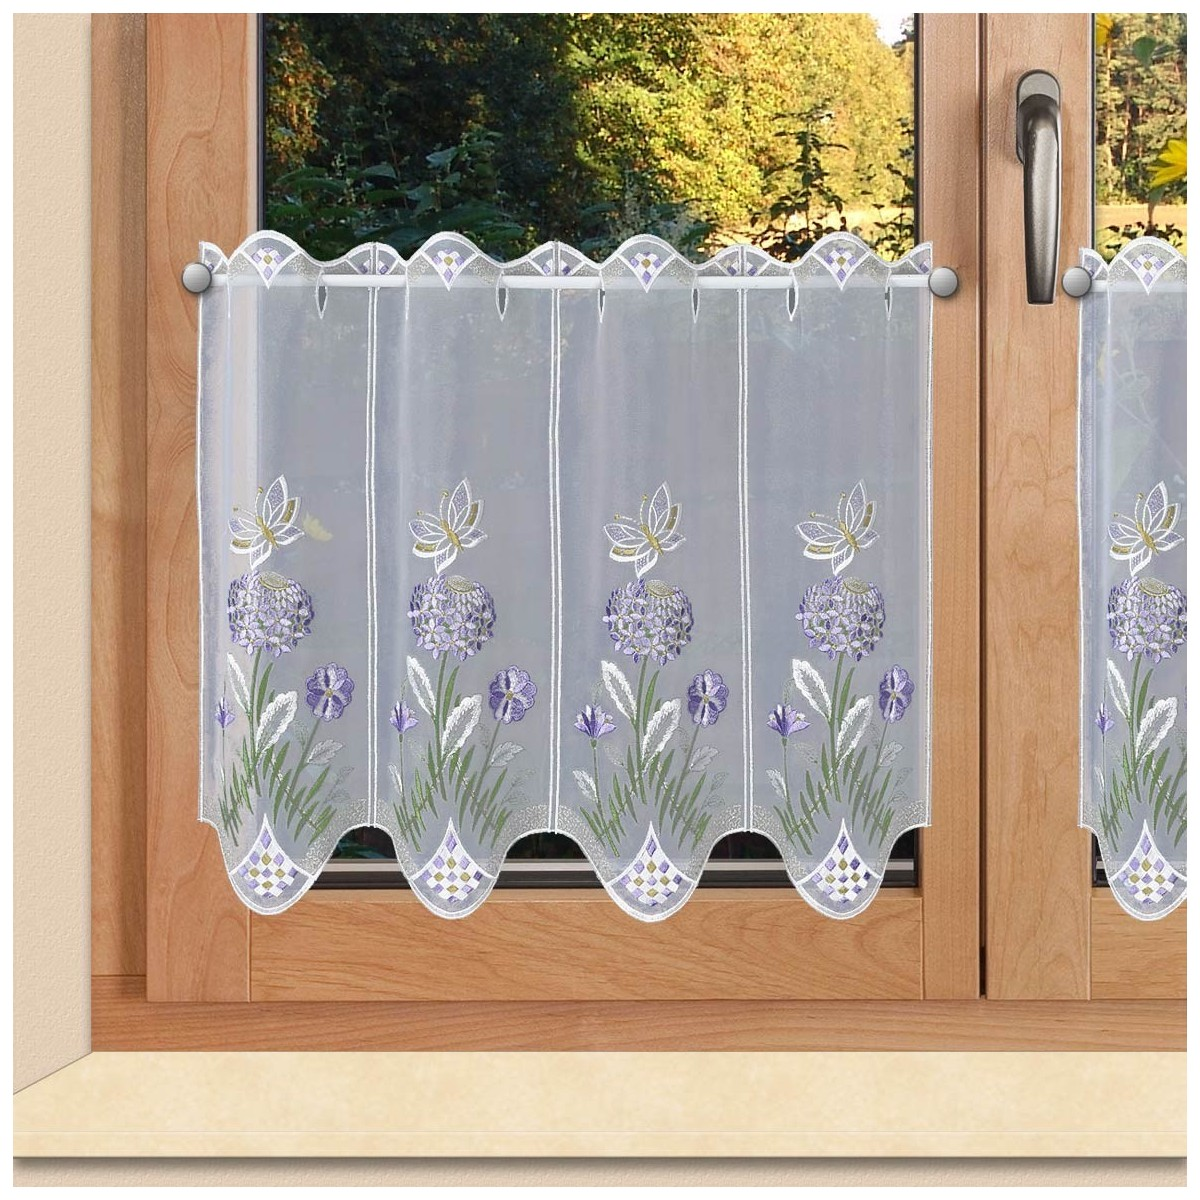 scheibengardinen panneau hyazinthe flieder plauener spitze. Black Bedroom Furniture Sets. Home Design Ideas